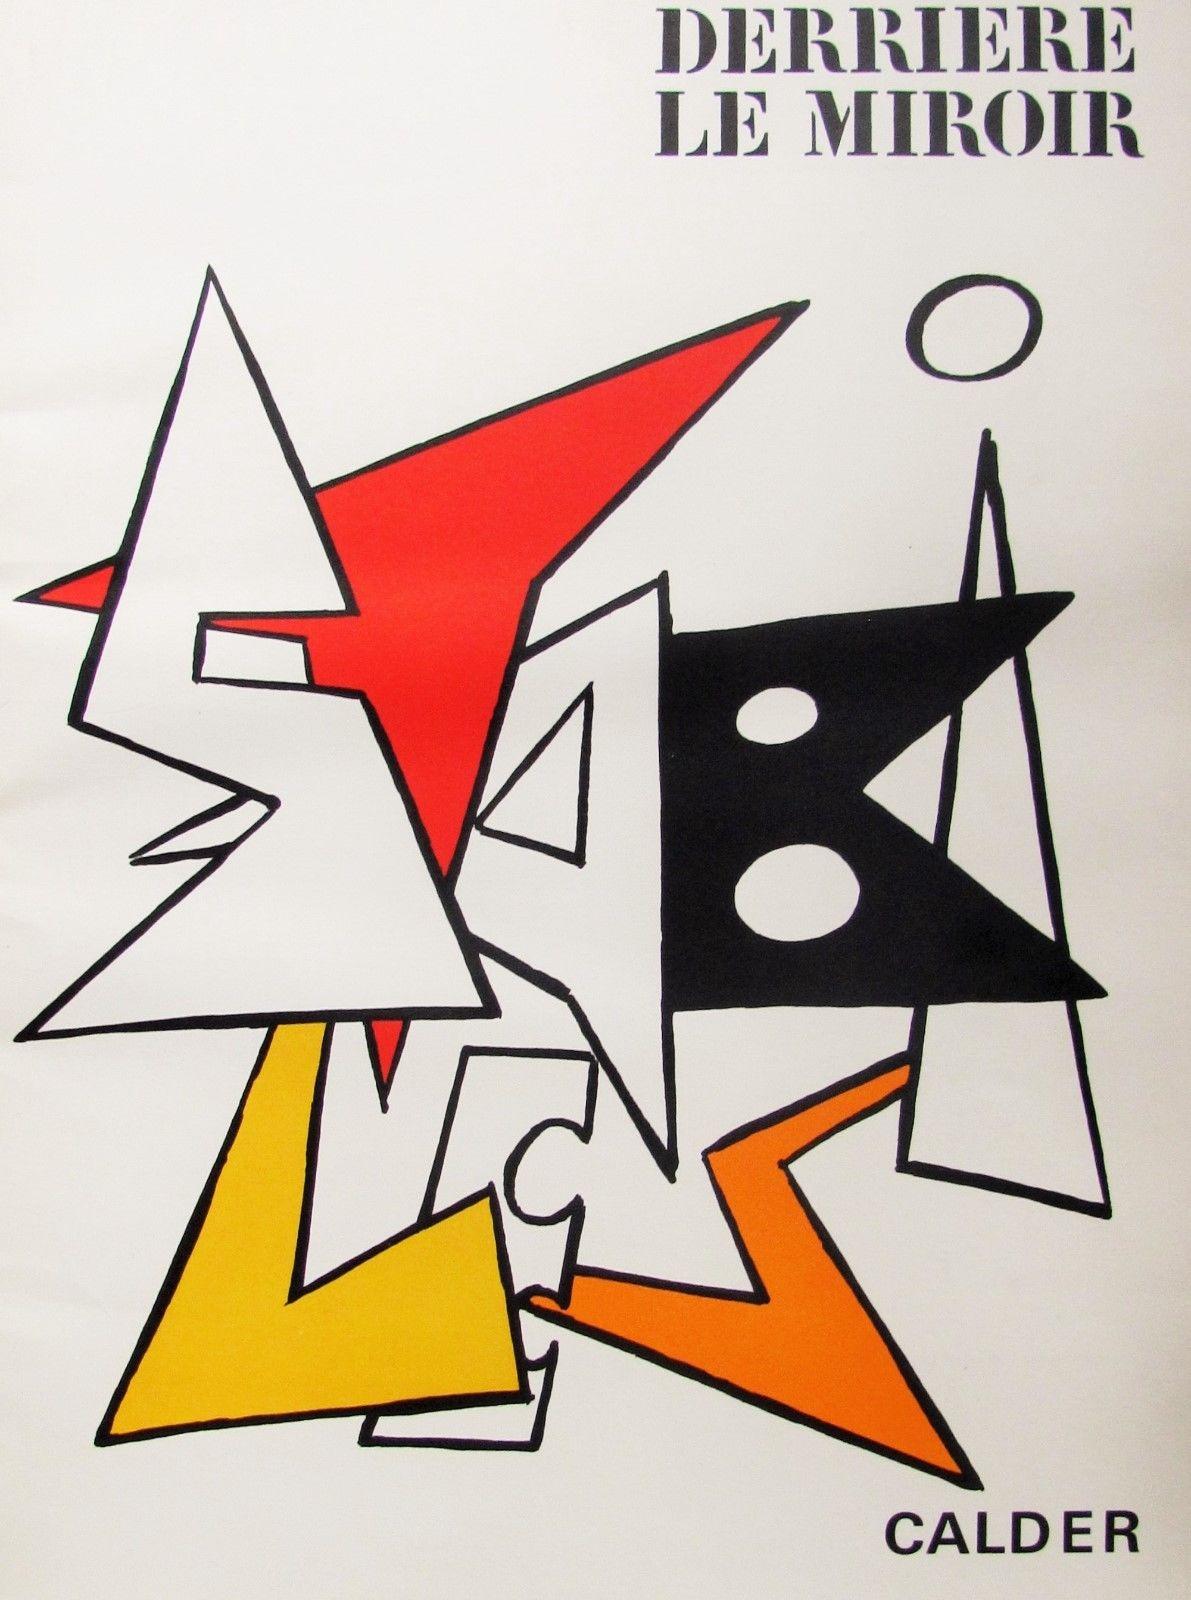 Alexander Calder Derriere Le Mirioir